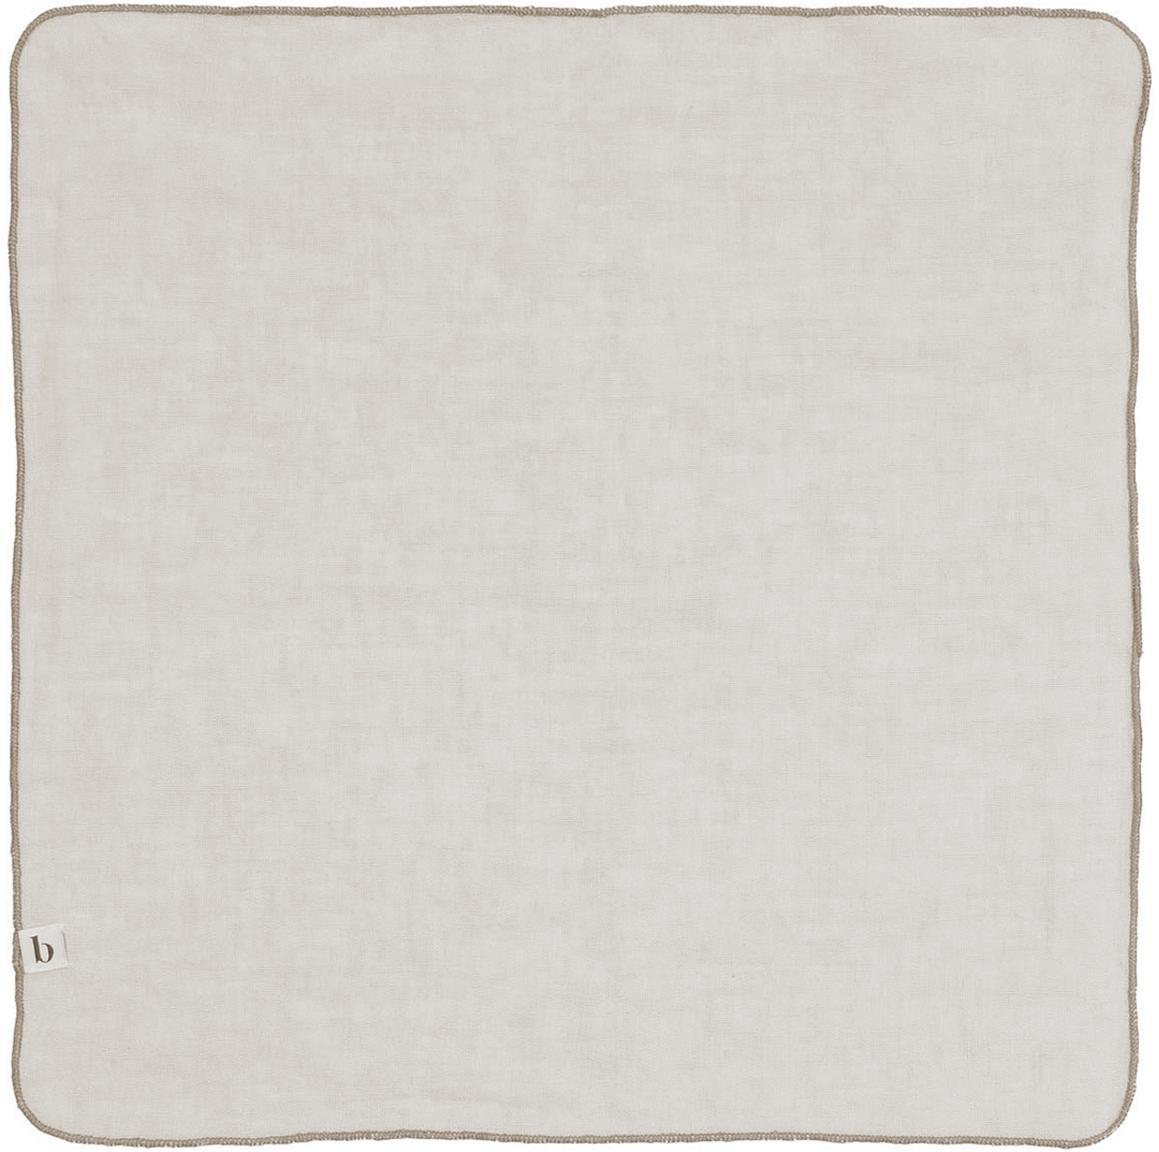 Servilletas de lino Gracie, 2uds., Lino natural, Gris, An 45 x L 45 cm